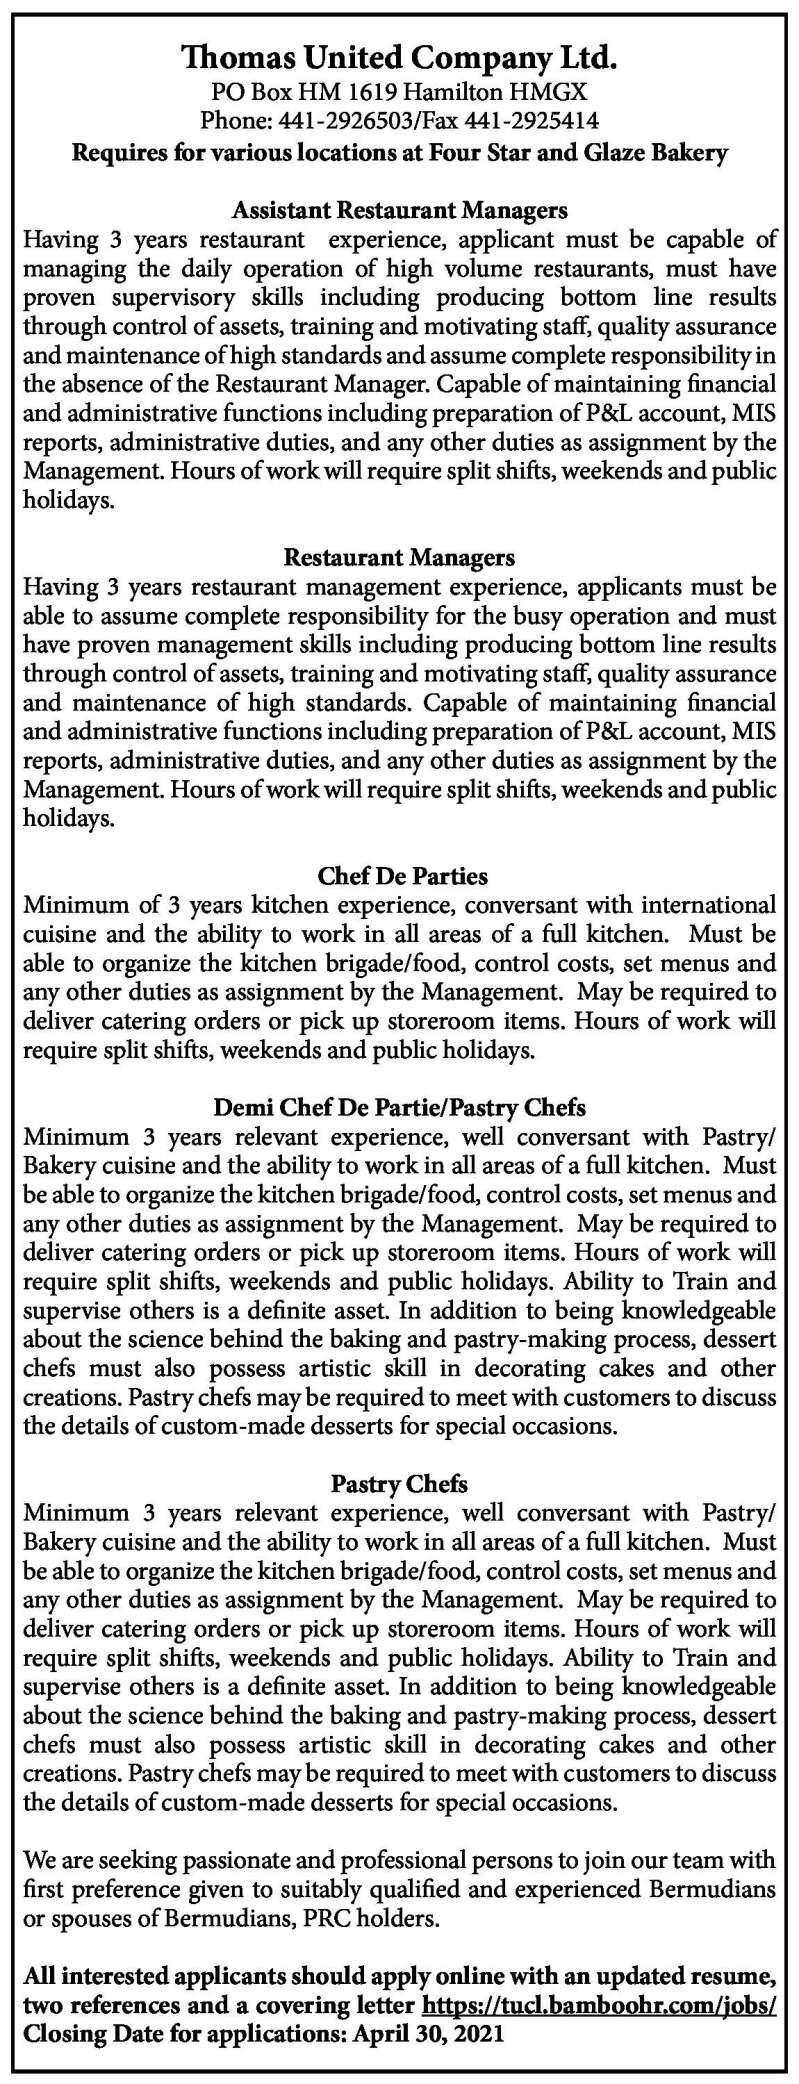 Assistant Restaurant Managers Restaurant Managers Chef De Parties Demi Chef De Partie Pastry Chefs Pastry Chefs The Royal Gazette Bermuda News Business Sports Events Amp Community